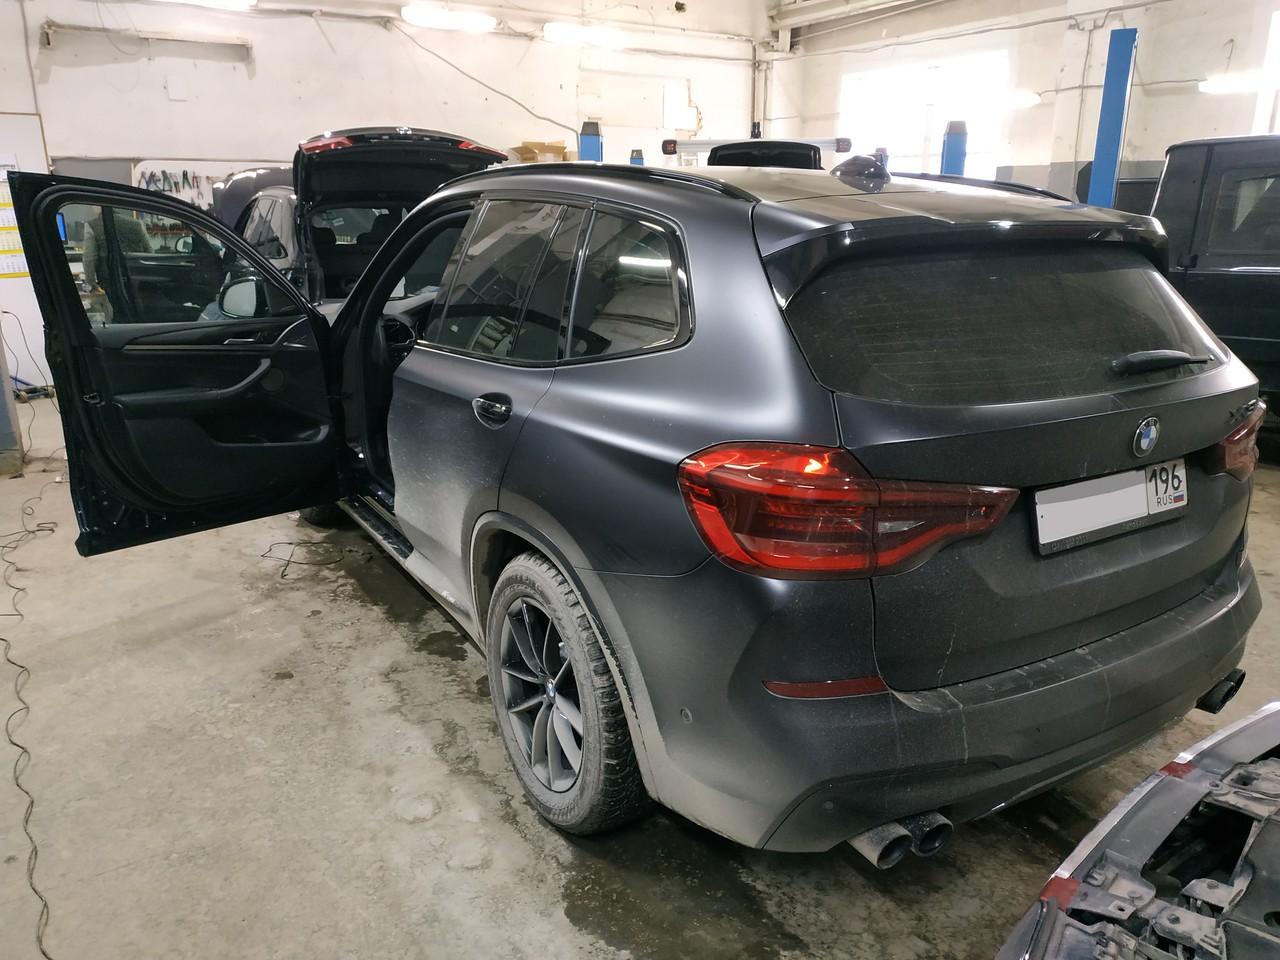 X3 G01, BMWupgrade Екатеринбург